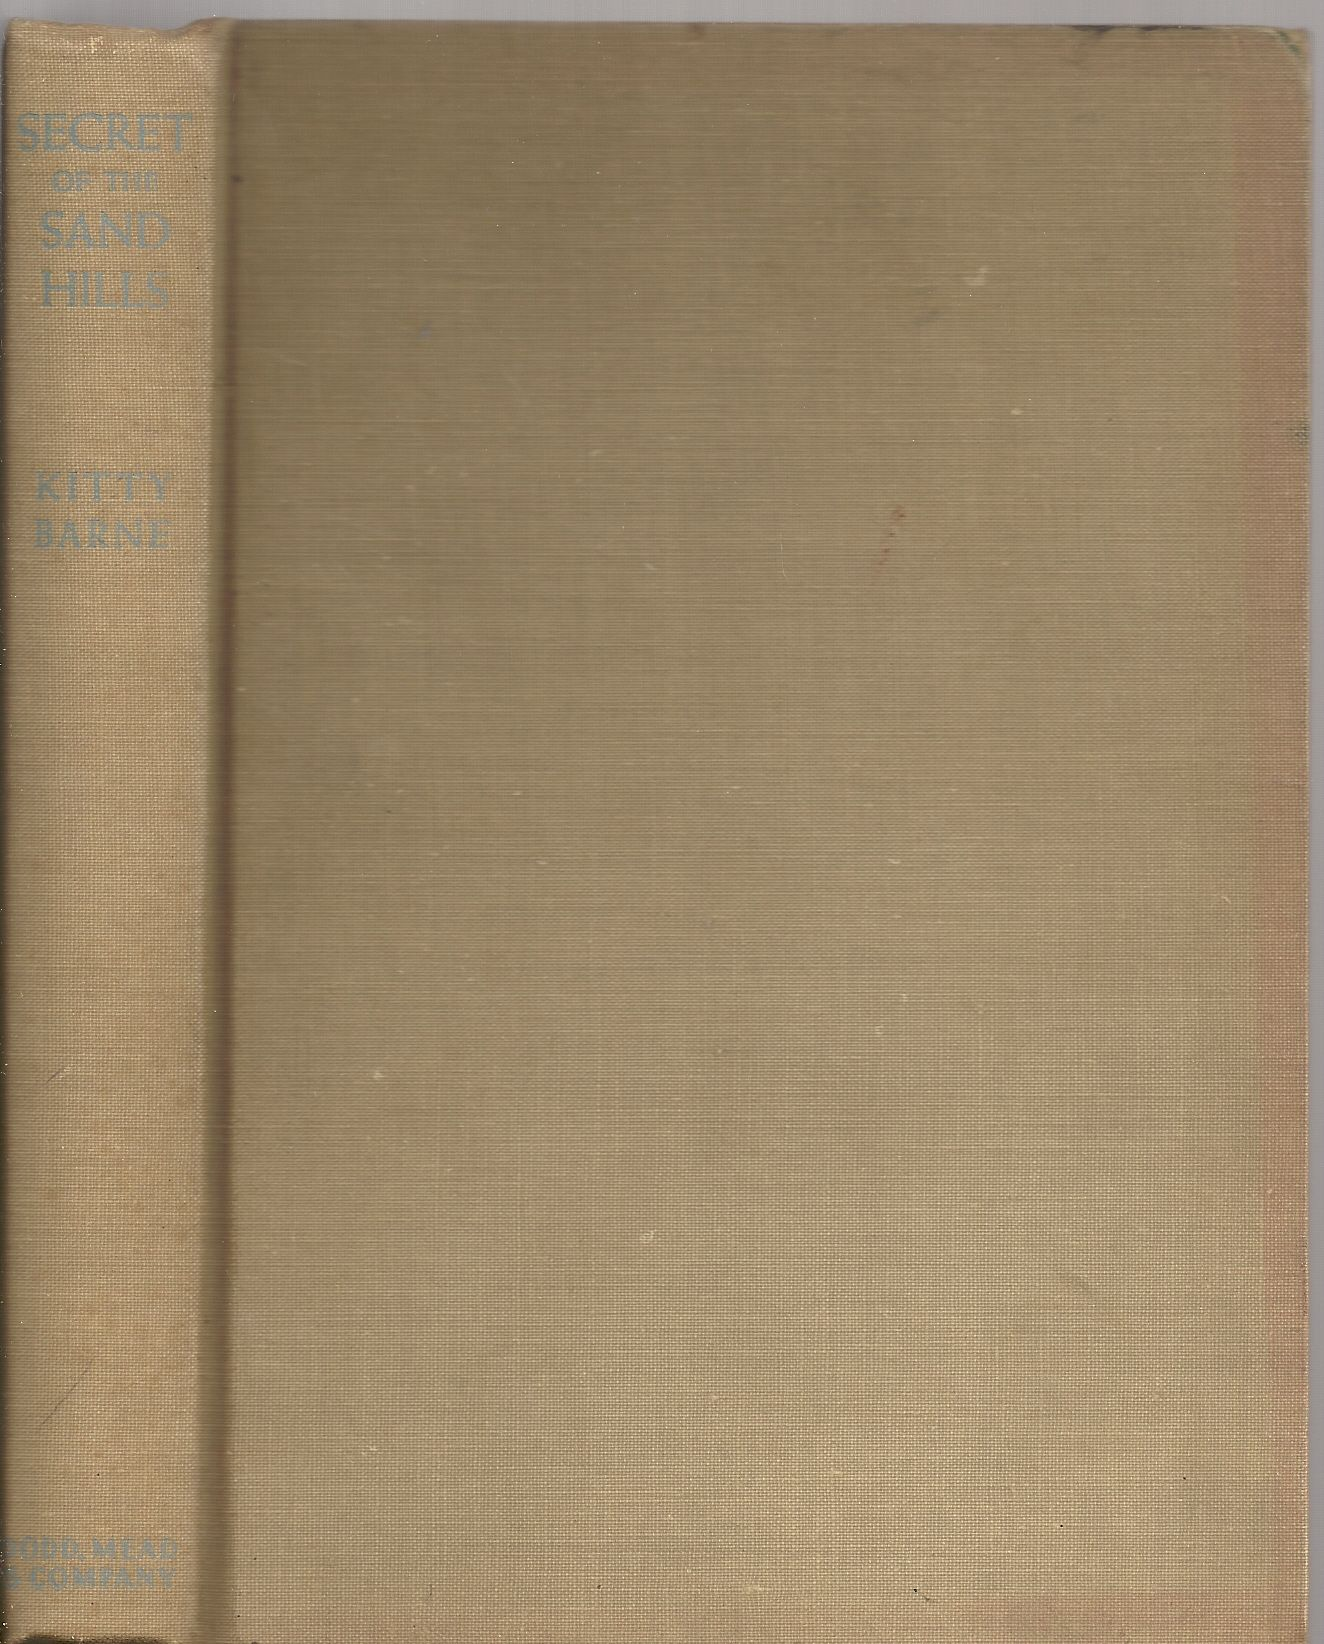 Secret of the sand hills (Junior Red badge mysteries), Barne, Kitty